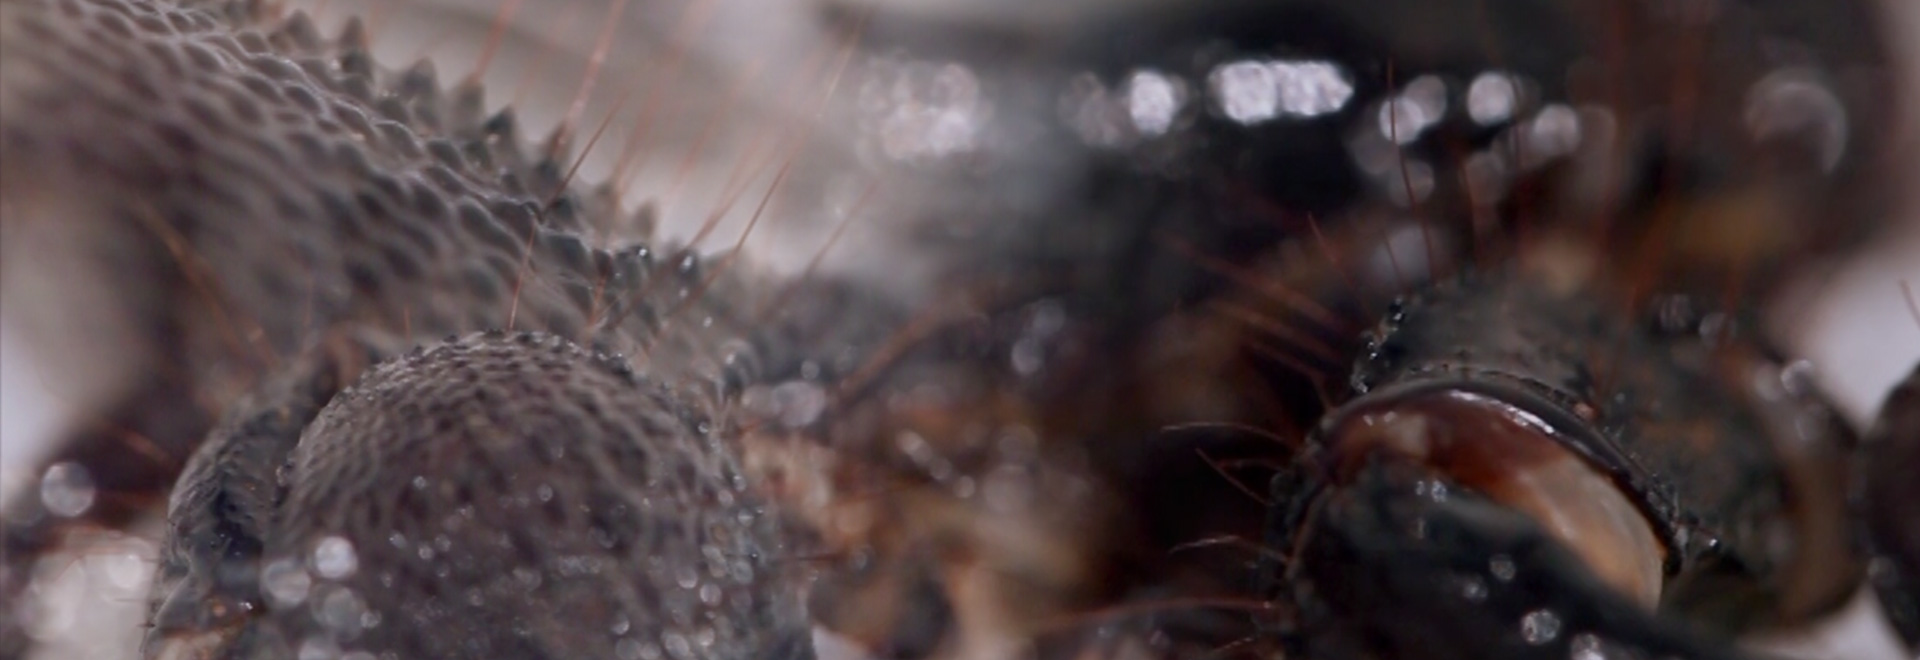 js-filmproduction-postproduction-viral-scorpion-header